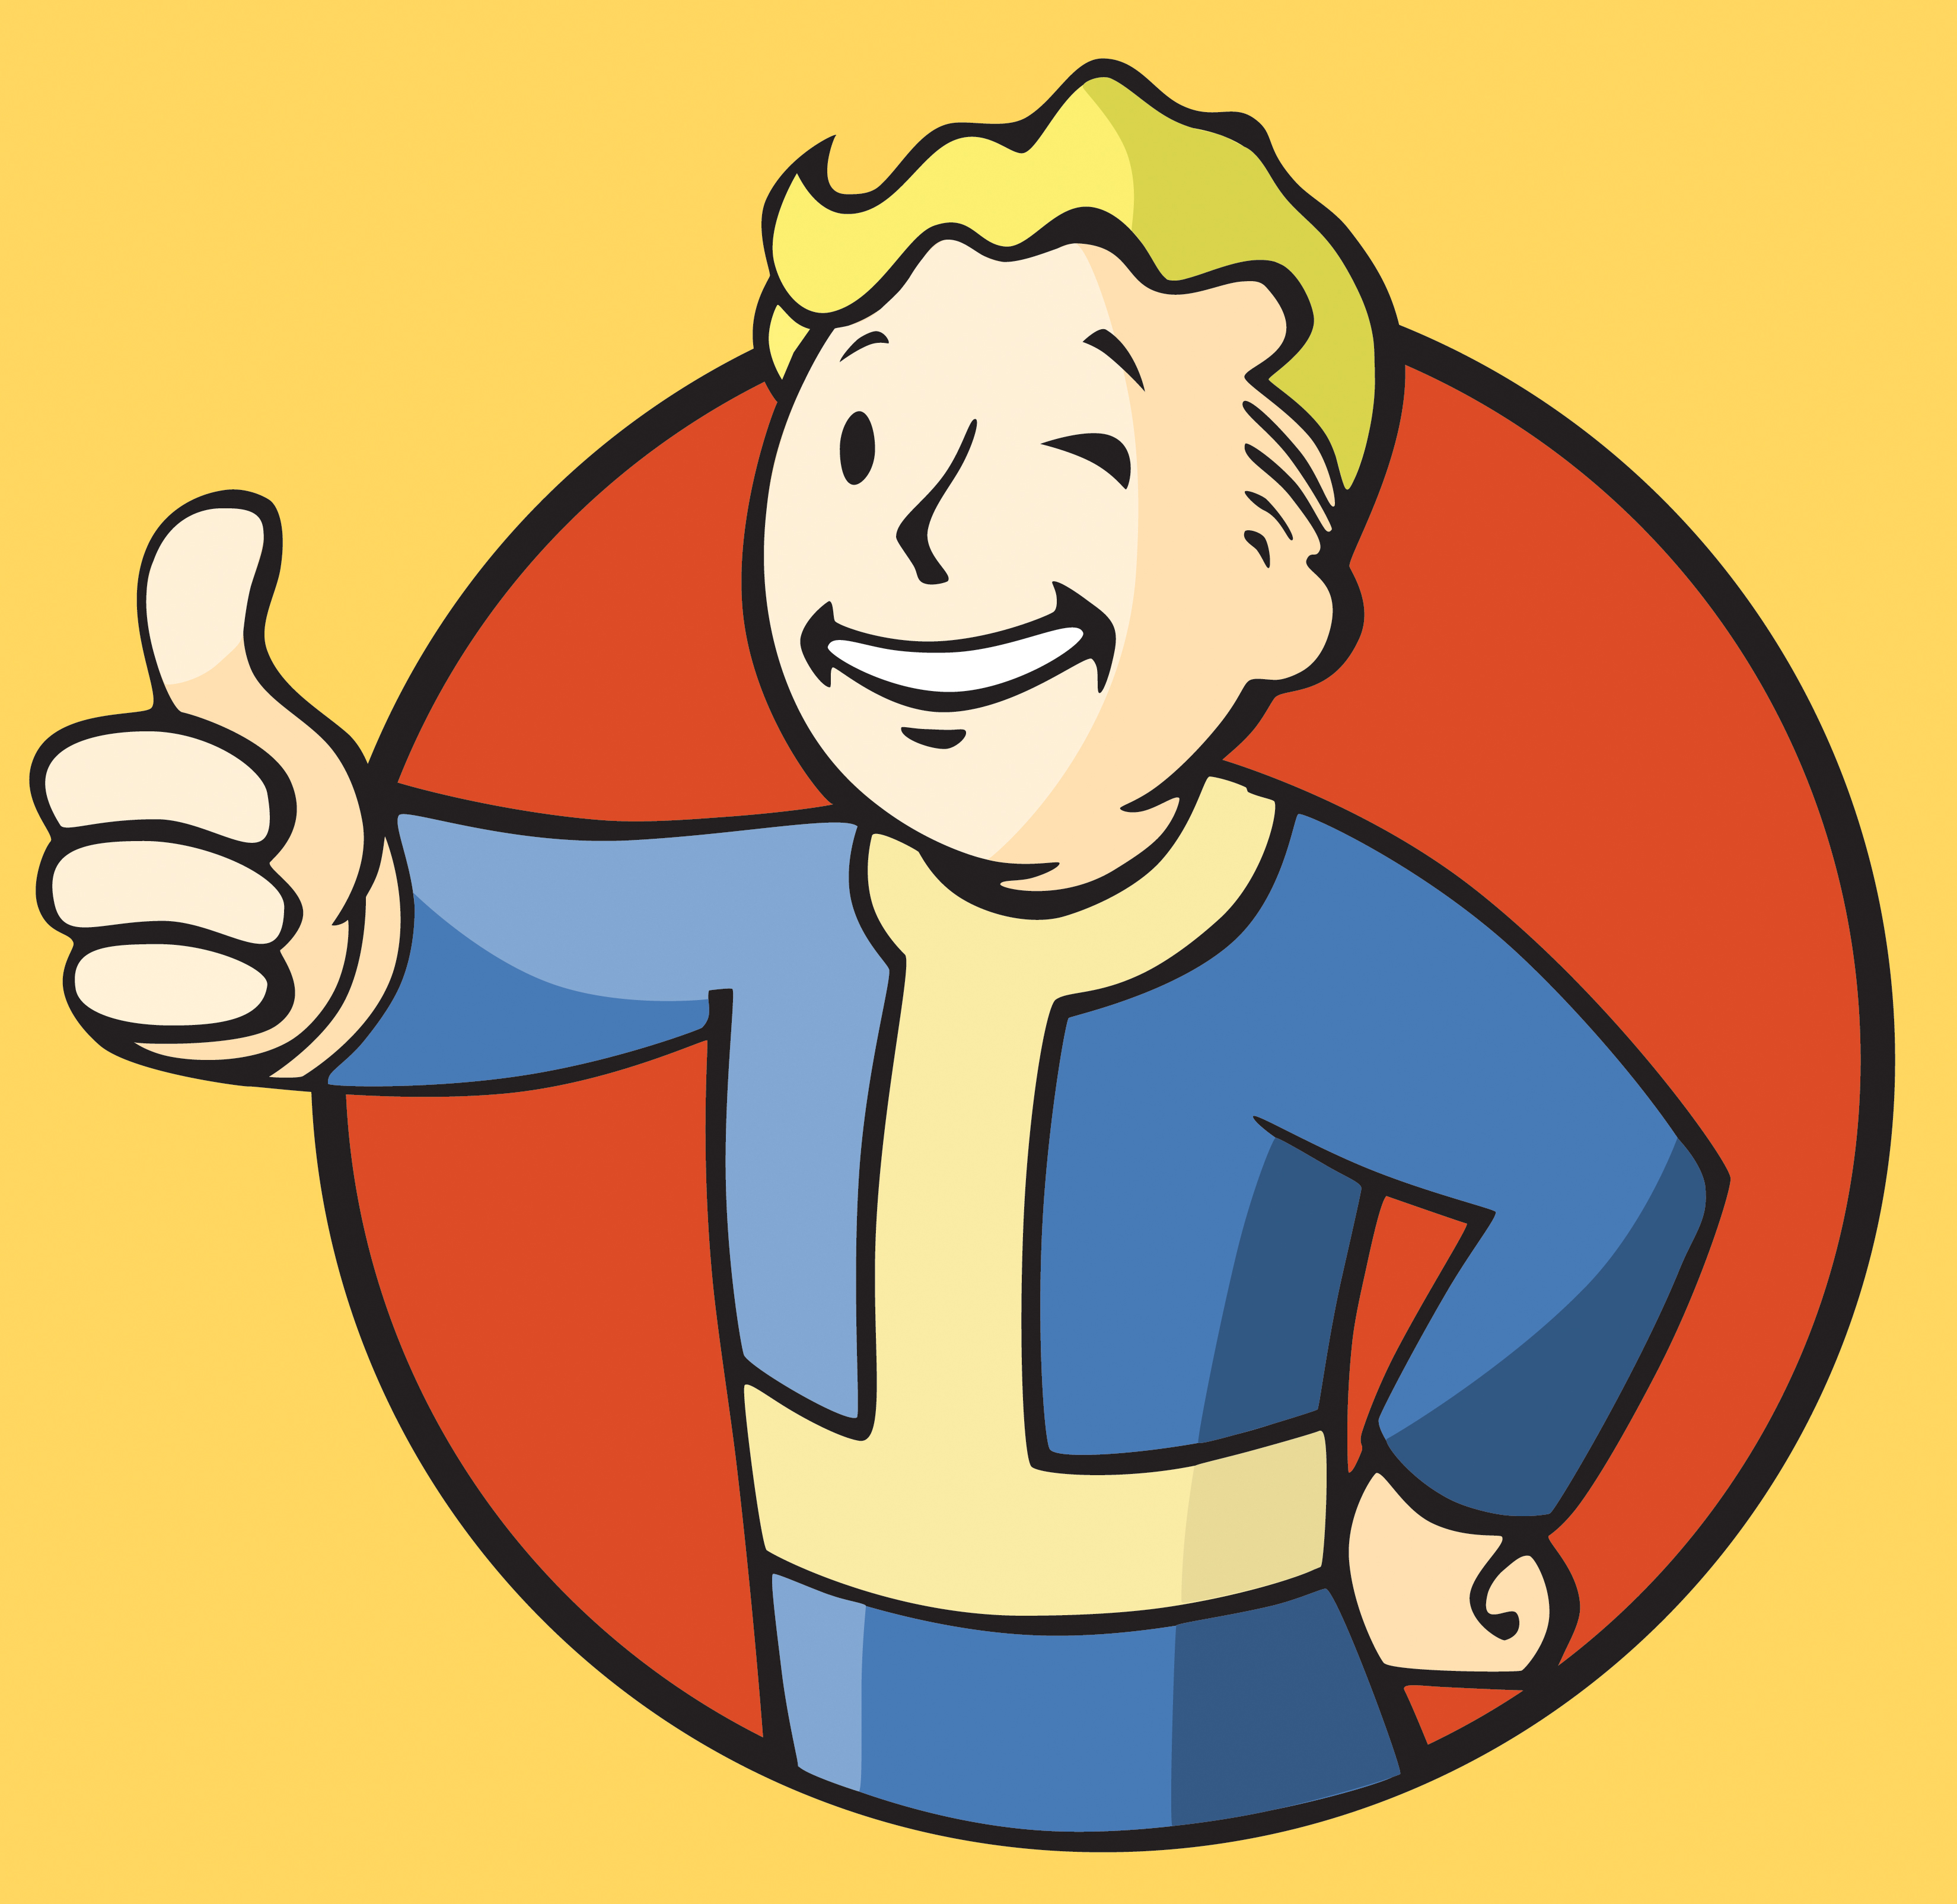 Fallout clipart vault tec Boy collections BBCpersian7 clipart ClipartFest